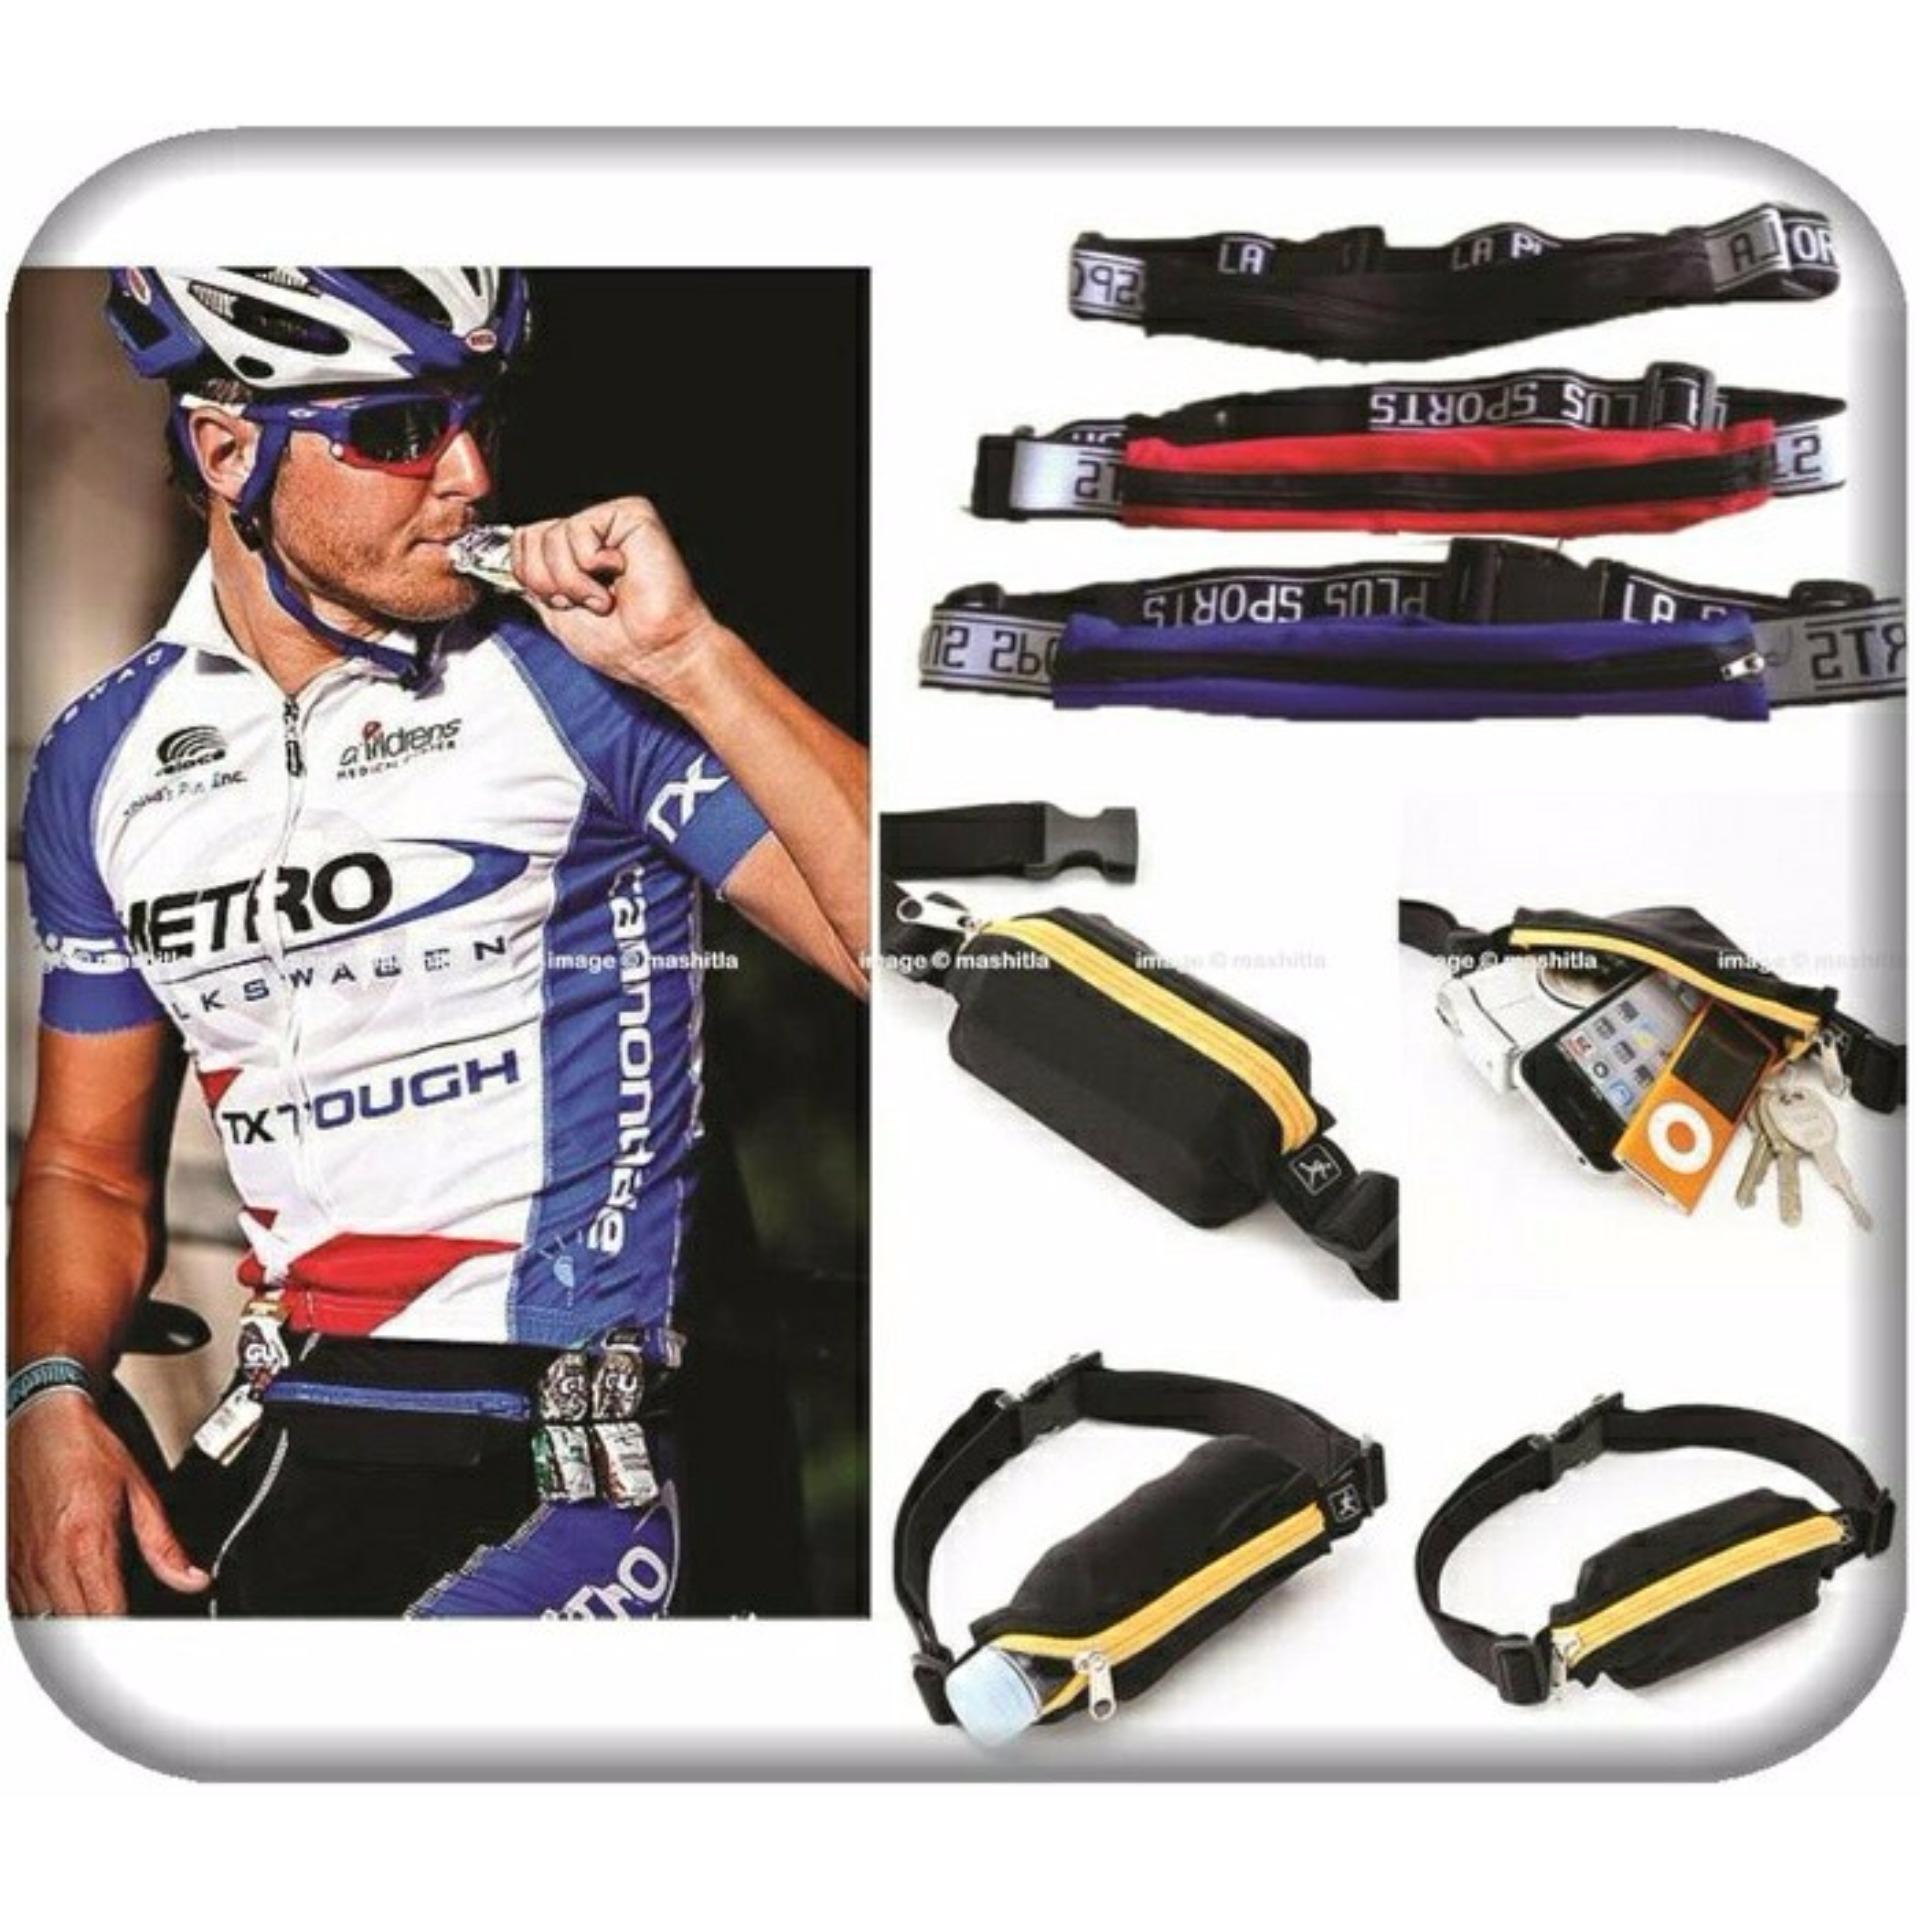 GO BELT BREWYN- belt/ikat pinggang multifungsi untuk sport/travelling - STRIPE PINK